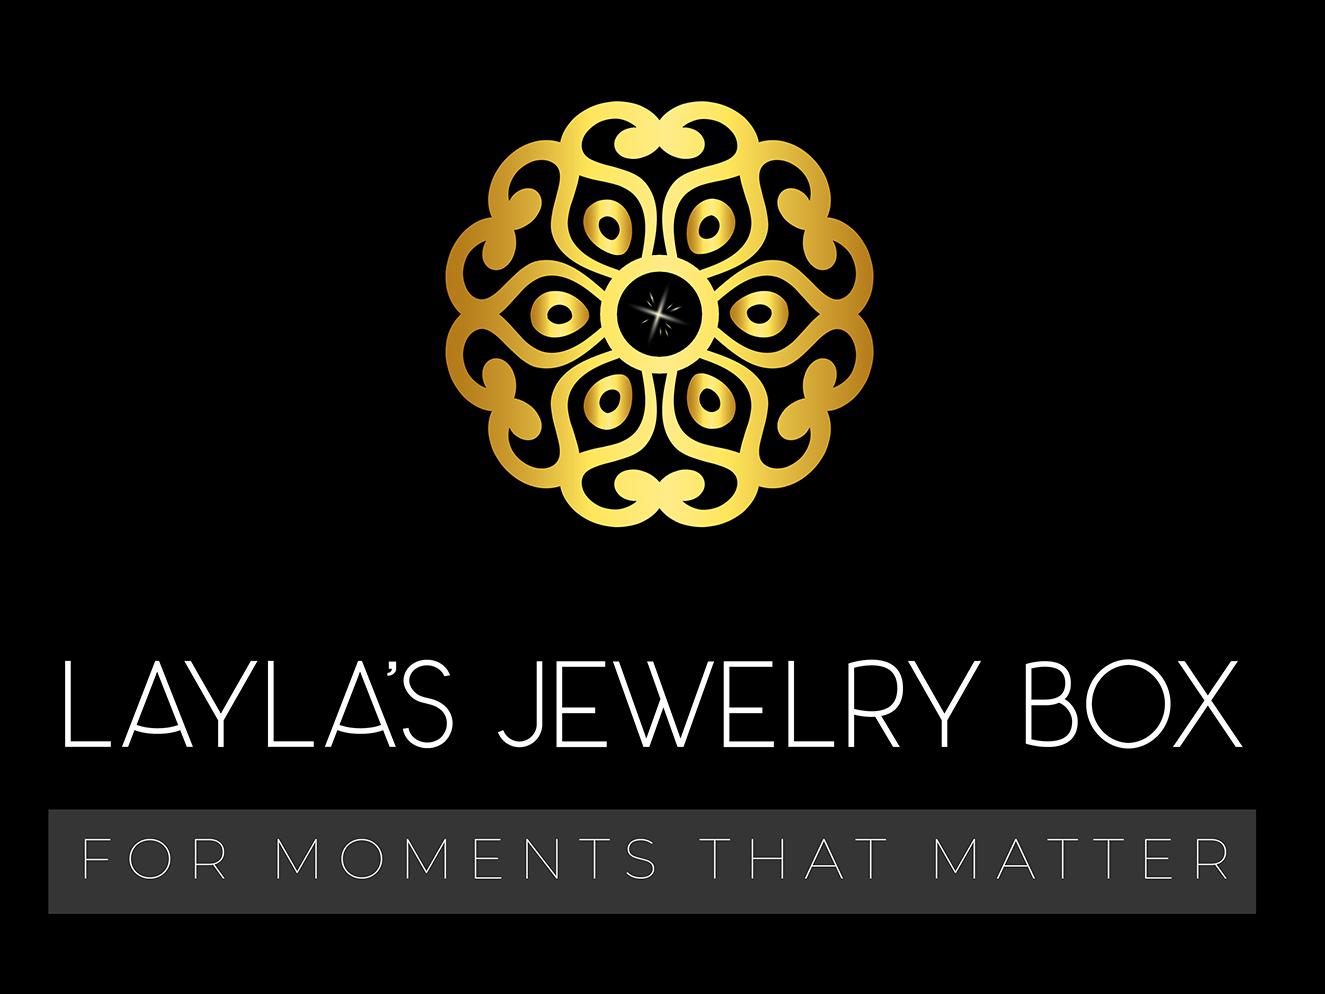 Layla's Jewelry Box graphic design brand clean minimal branding illustration vector design flat akshay jewelry jewelry logo minimalist logo logo design logo